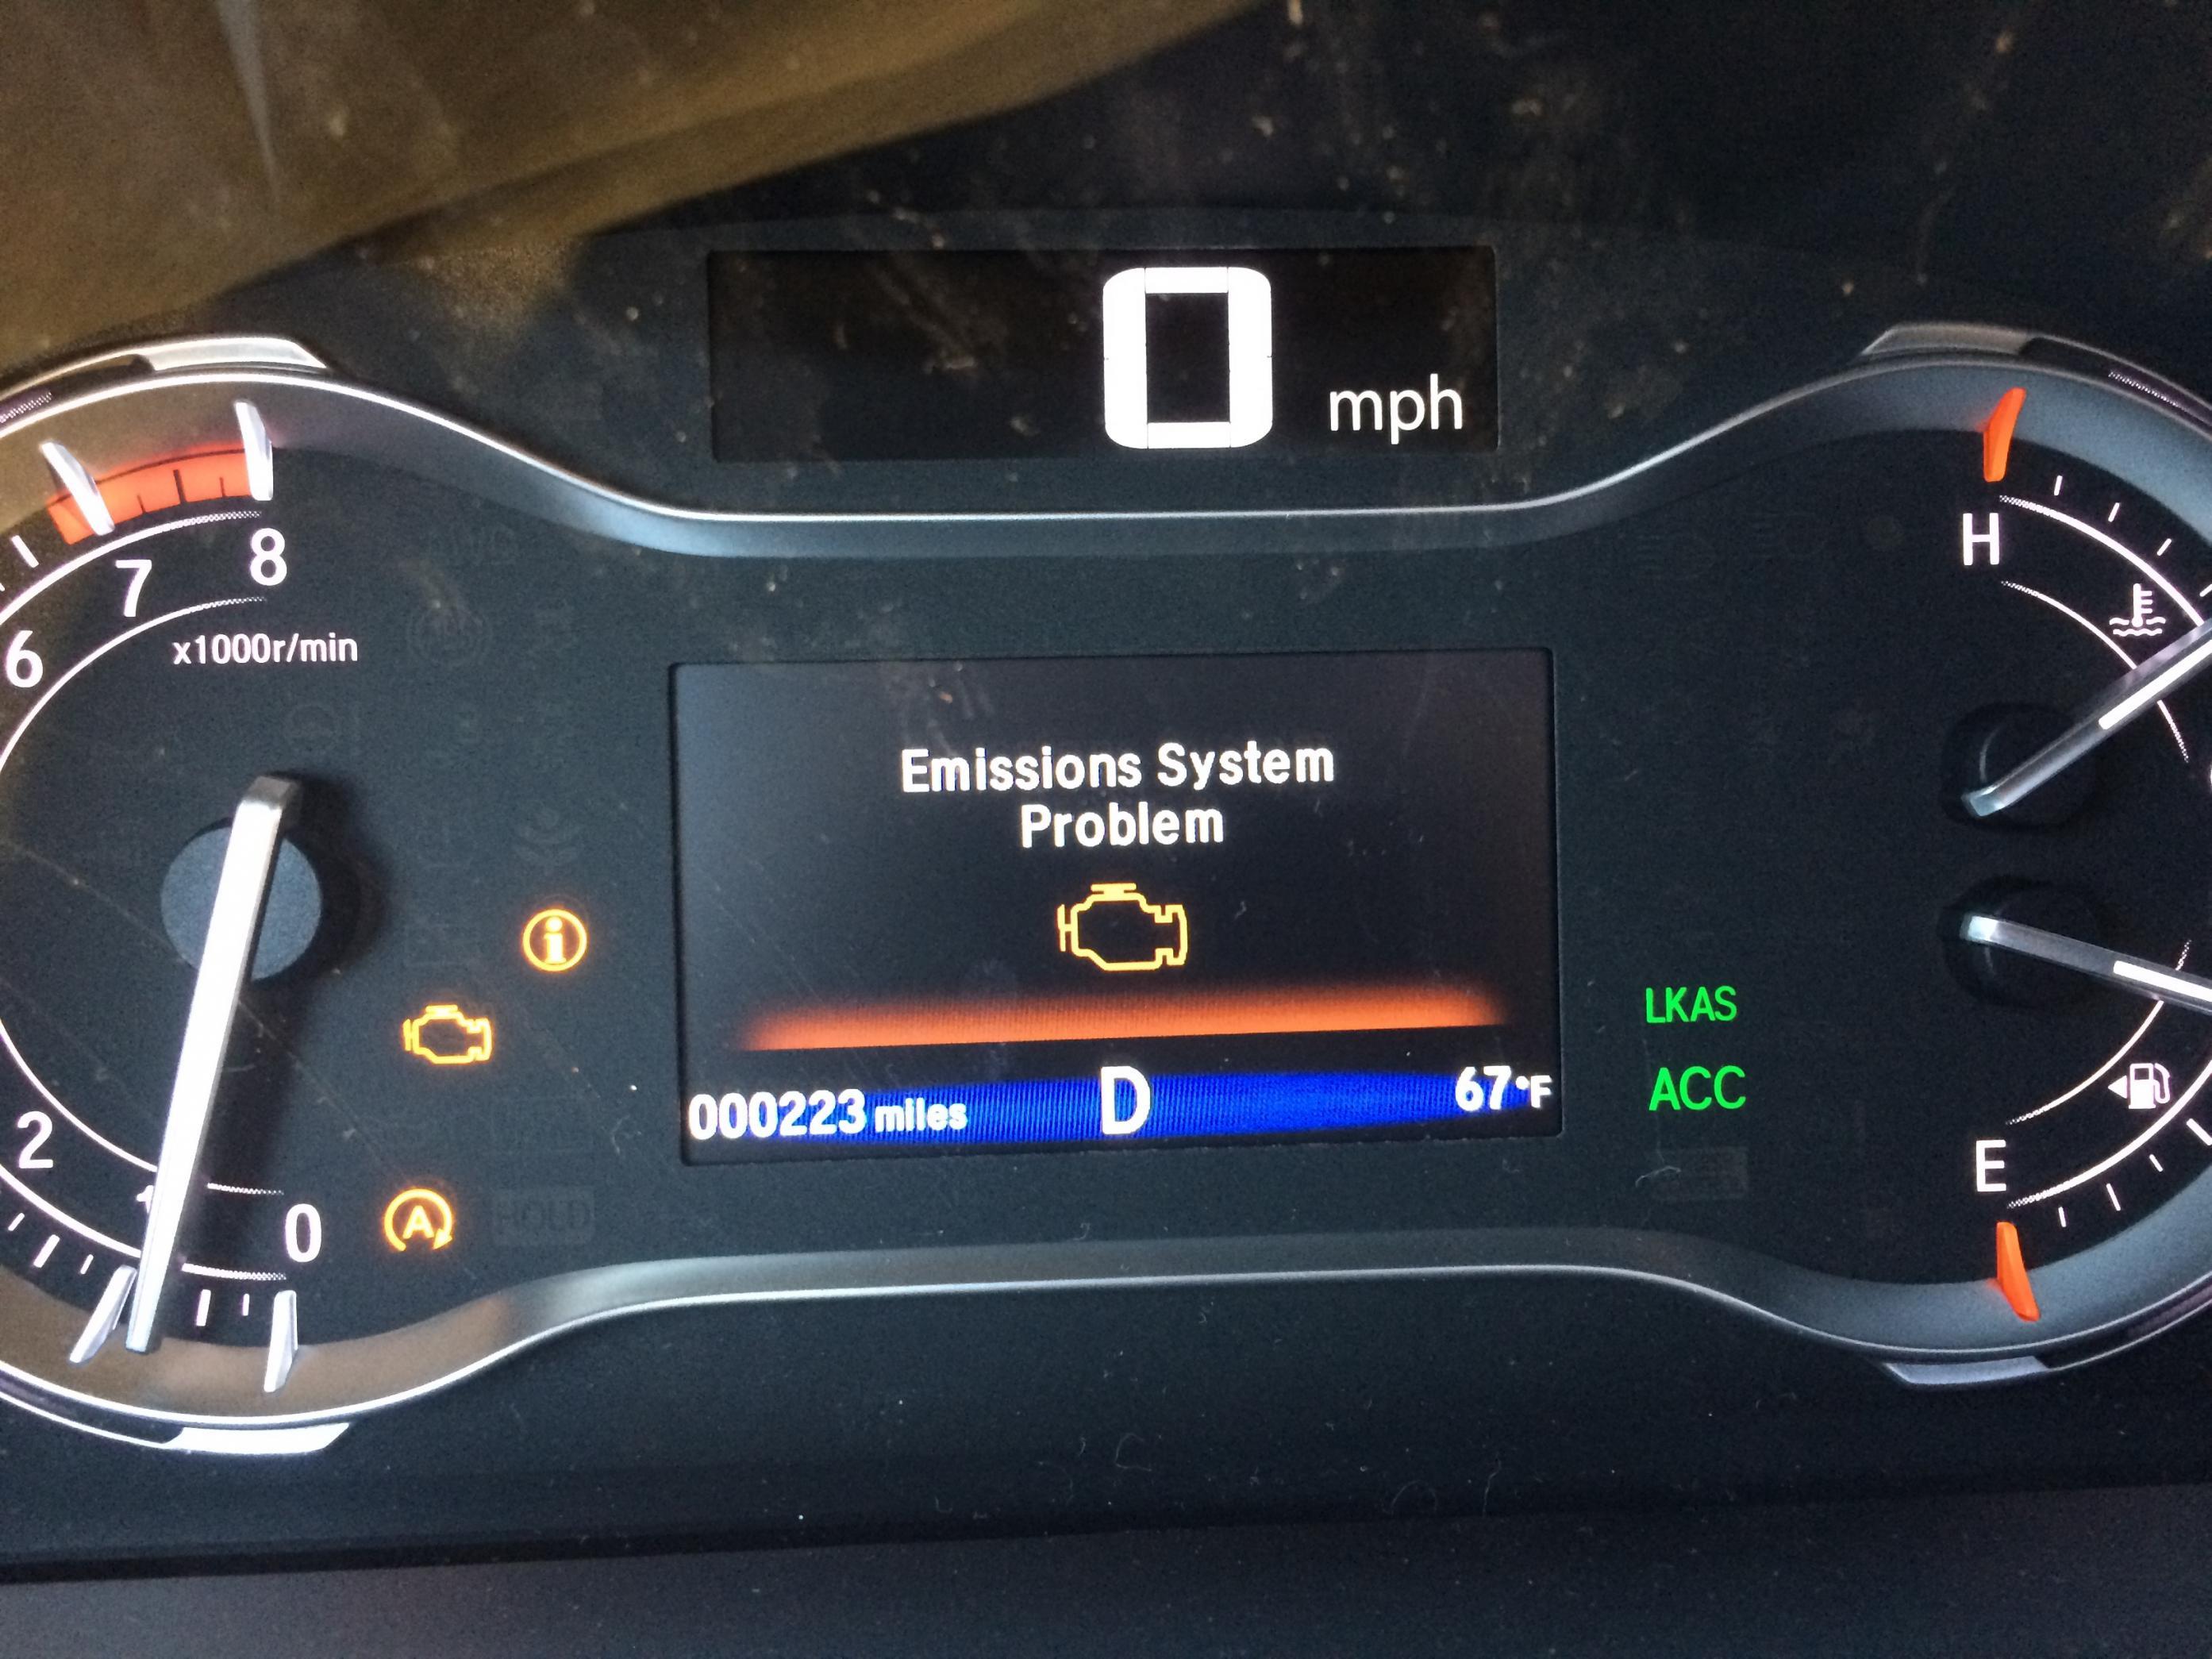 emissions light on honda civic | Best Cars Modified Dur A Flex